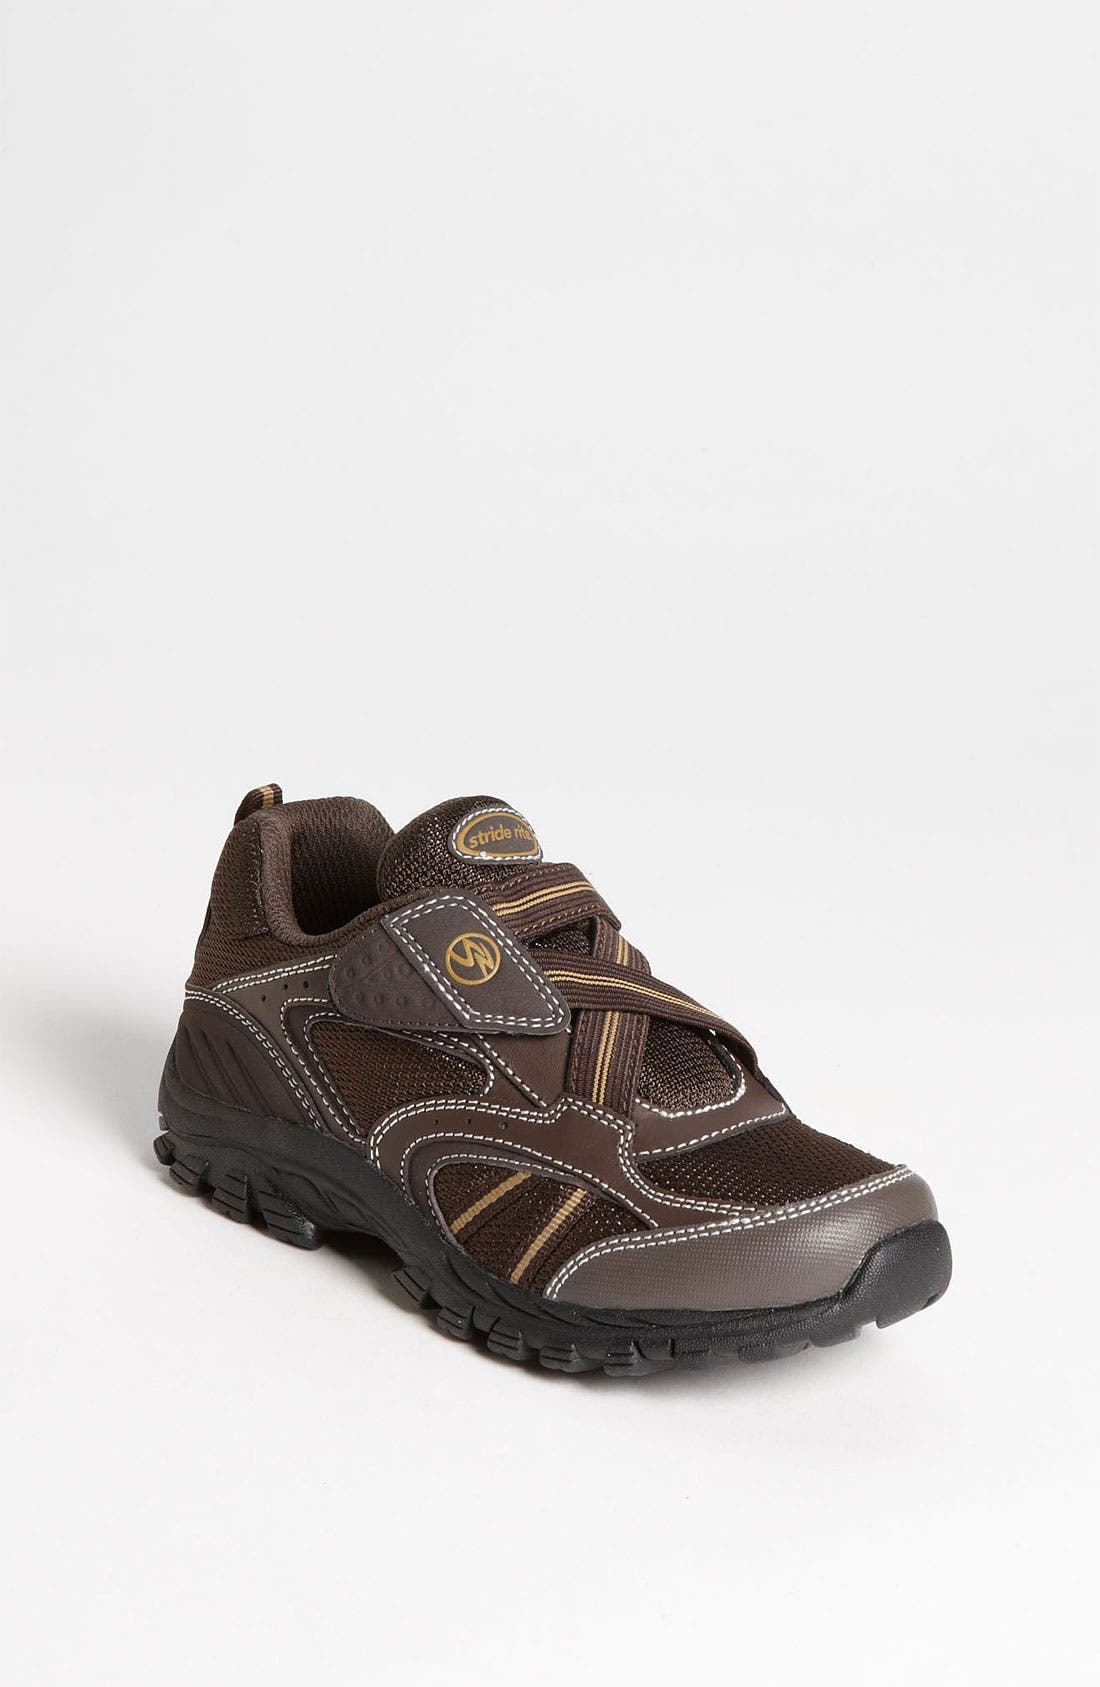 Alternate Image 1 Selected - Stride Rite 'Clayton' Sneaker (Toddler & Little Kid)